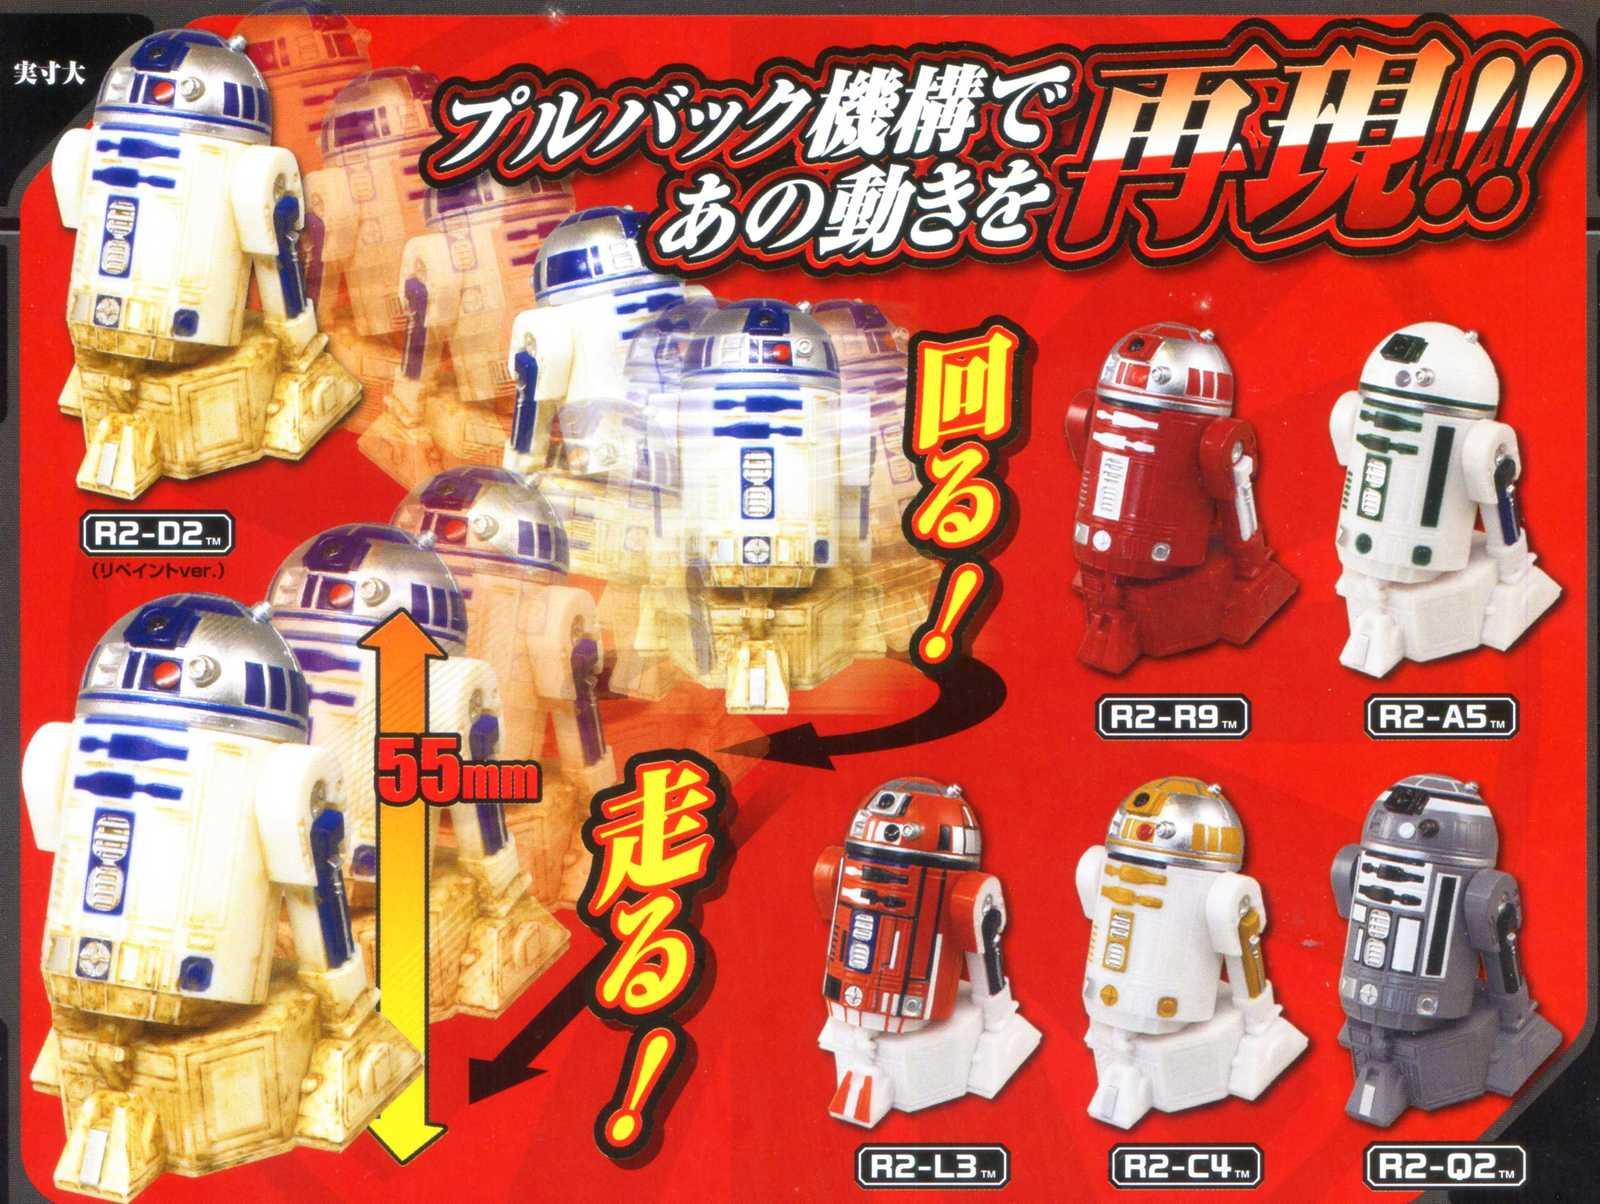 TAKARA TOMY ARTS STAR WARS Characters GACHA GALAXY PULLBACK DROID Phase 2 R2-R9